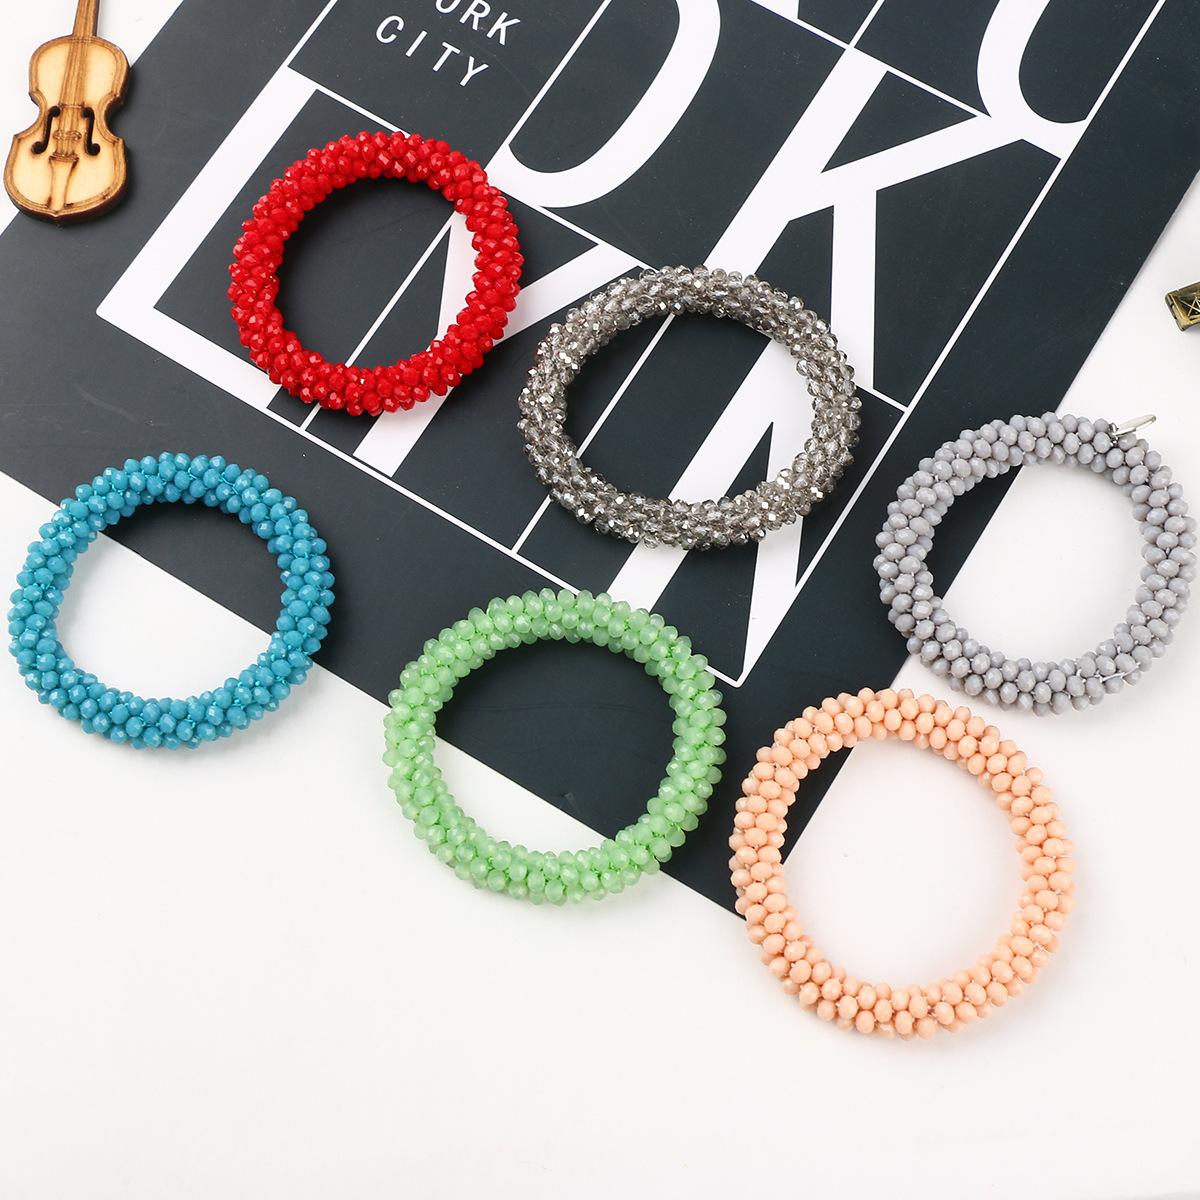 Popular artificial crystal bracelet, colorful beaded, crocheted, elastic thread Bracelet